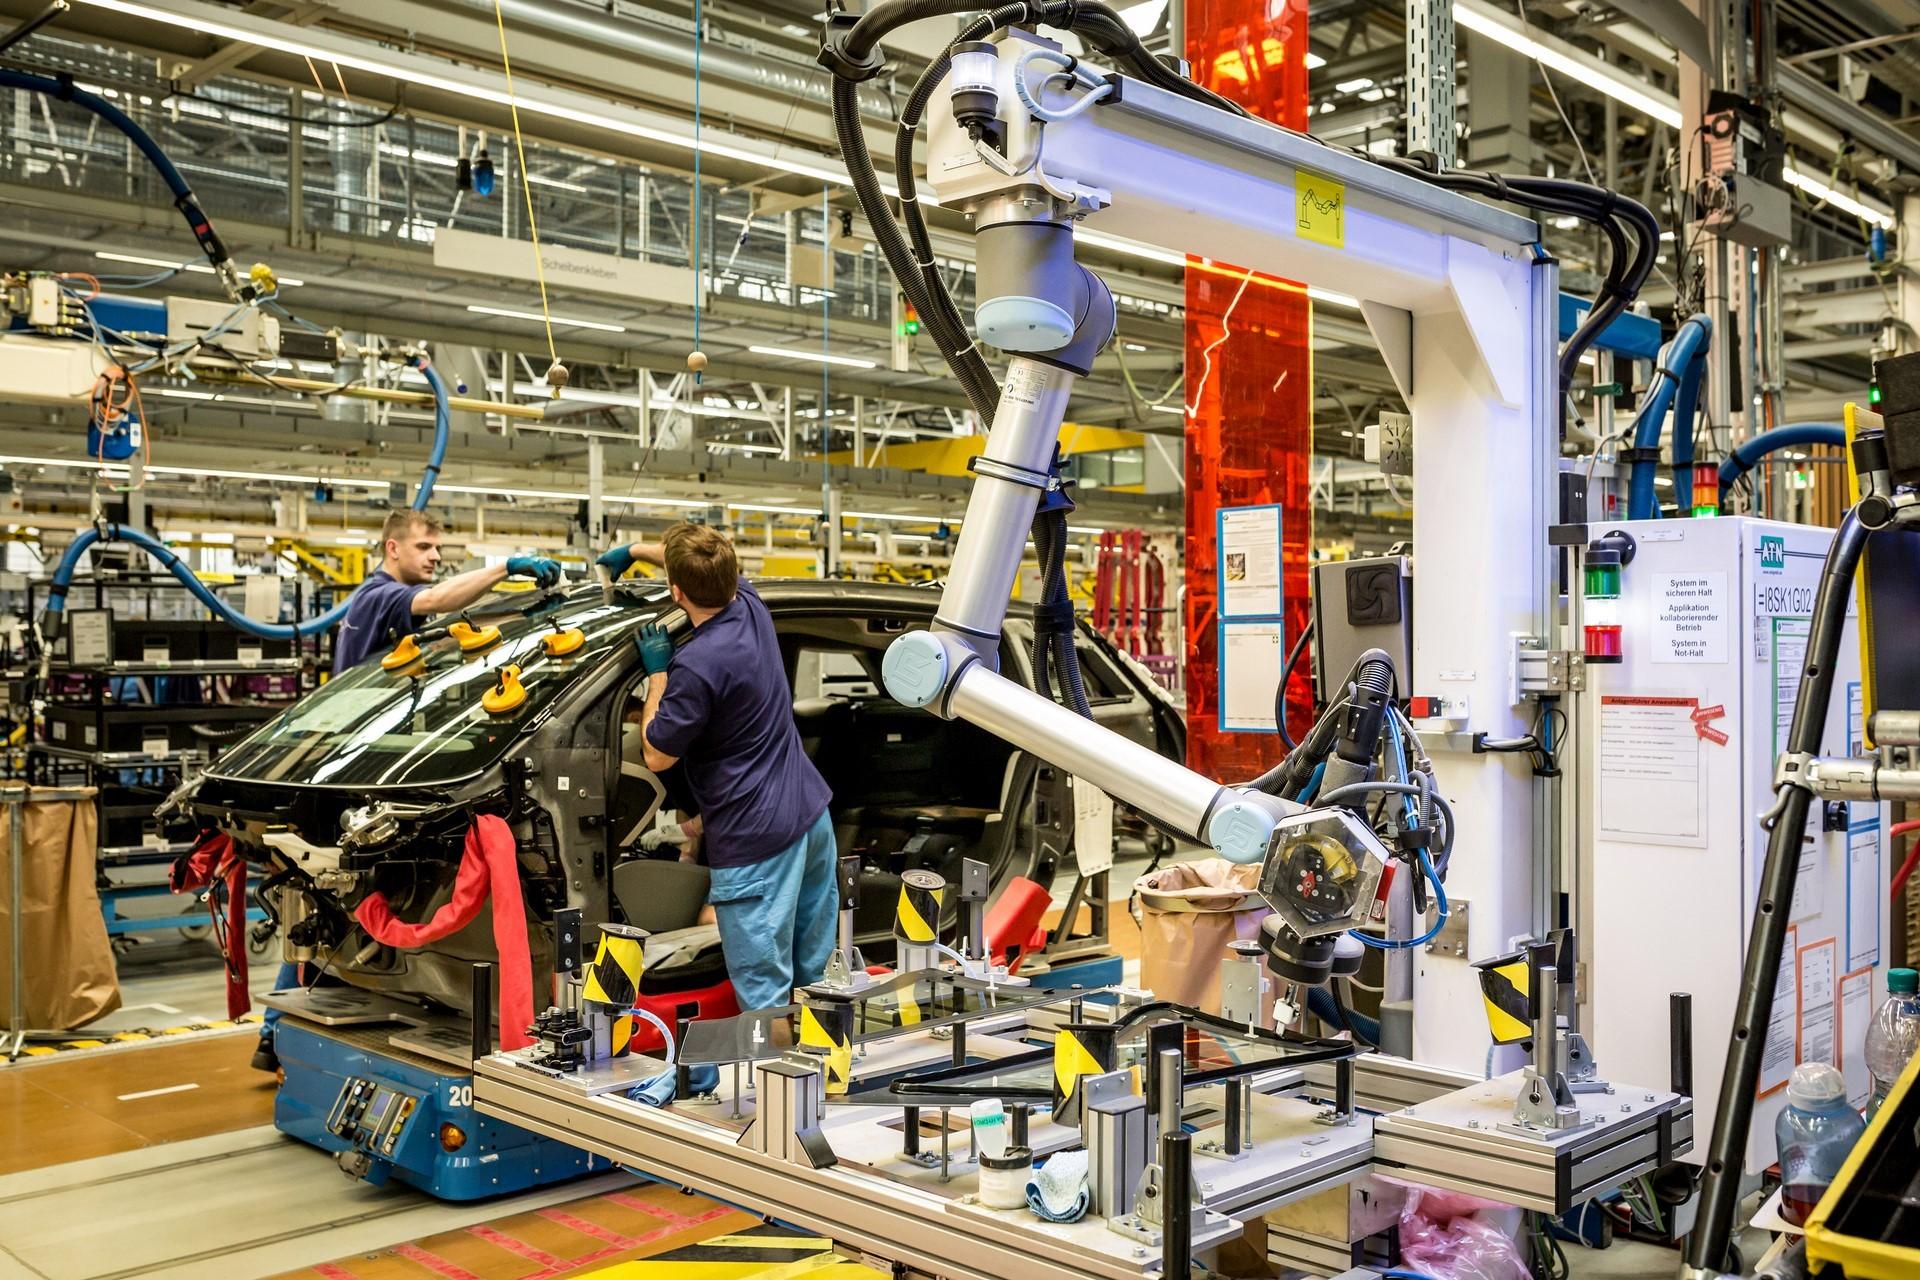 BMW humans robots (21)